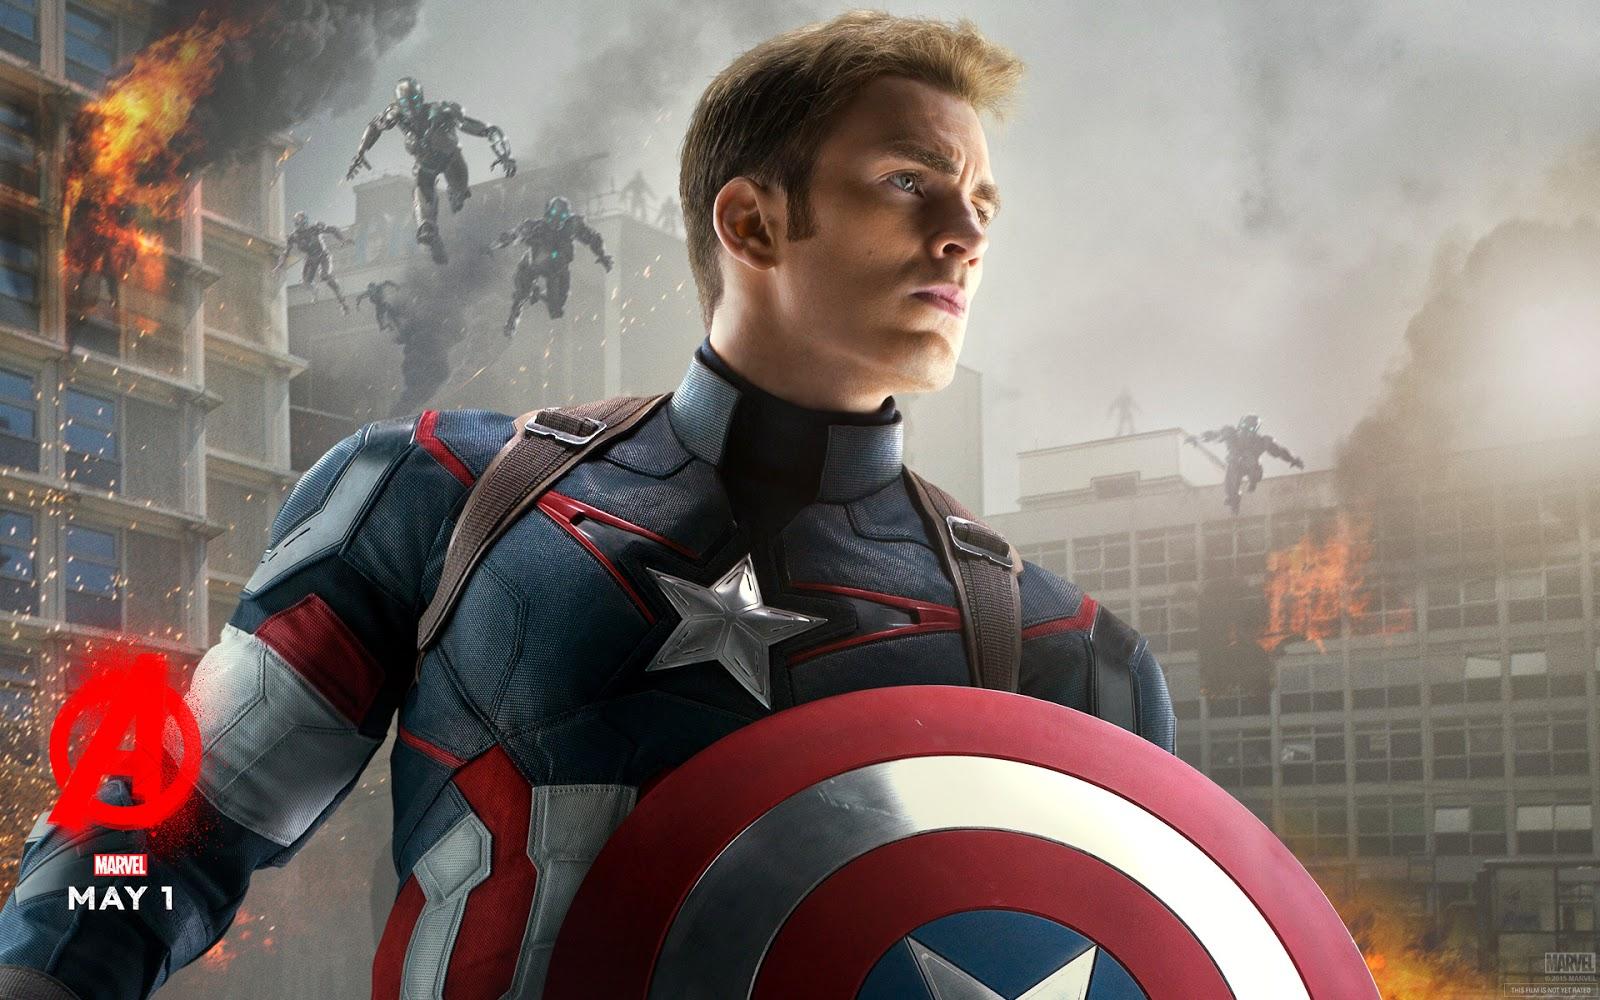 captain america avengers age of ultron wallpapers - Images From Avengers Age of Ultron Marvel